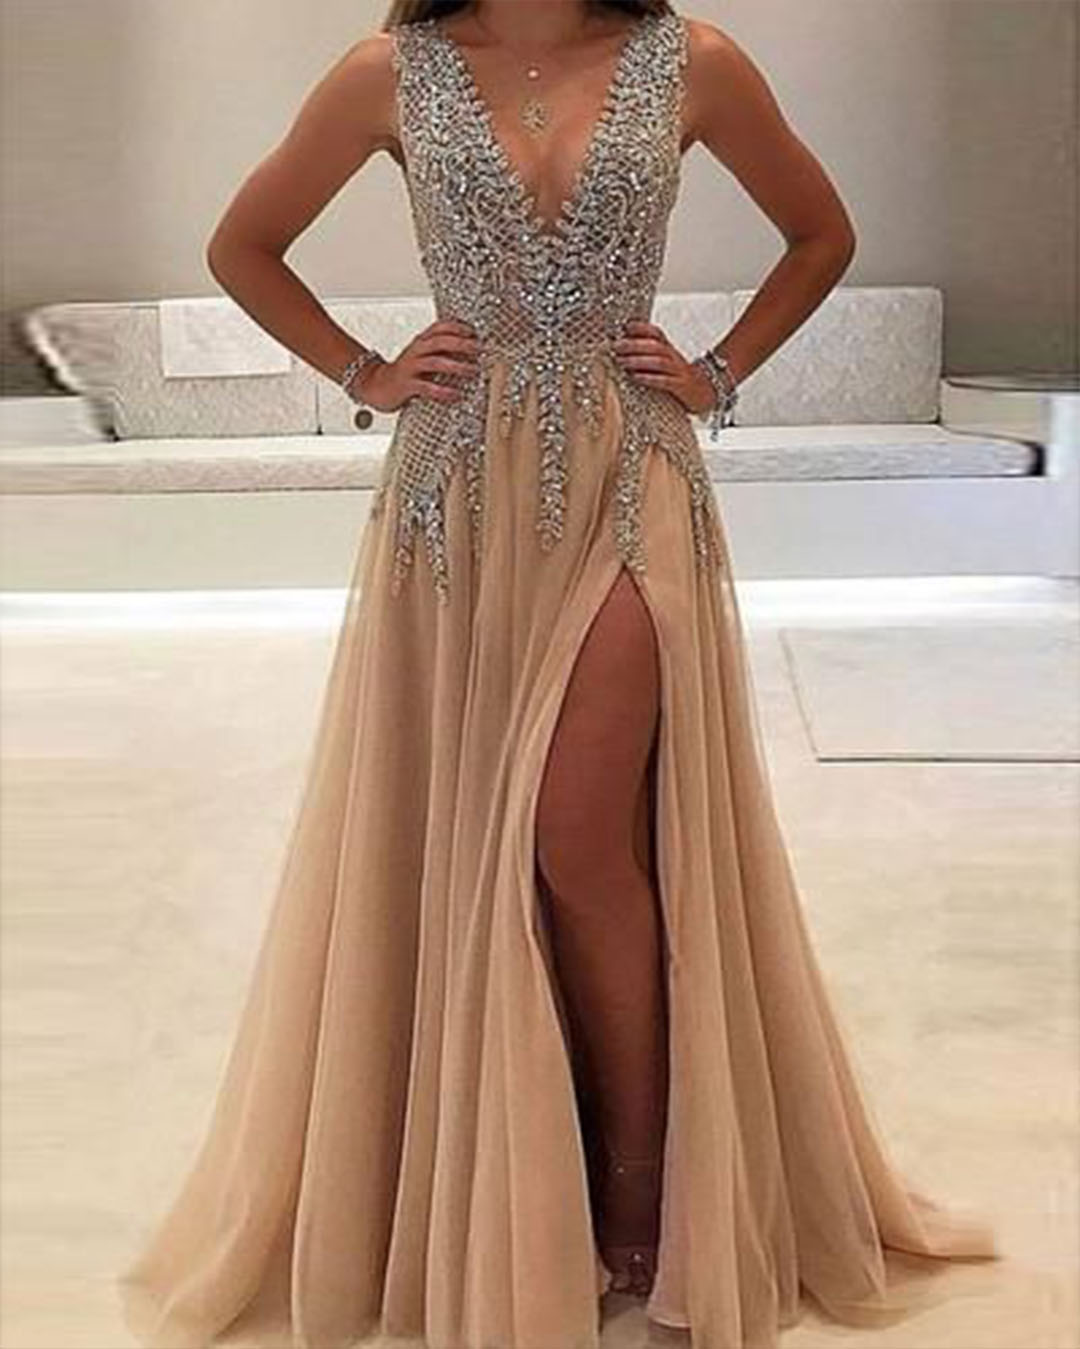 d68eb47da Vestidos de NOCHE elegantes que no conoces - ElSexoso